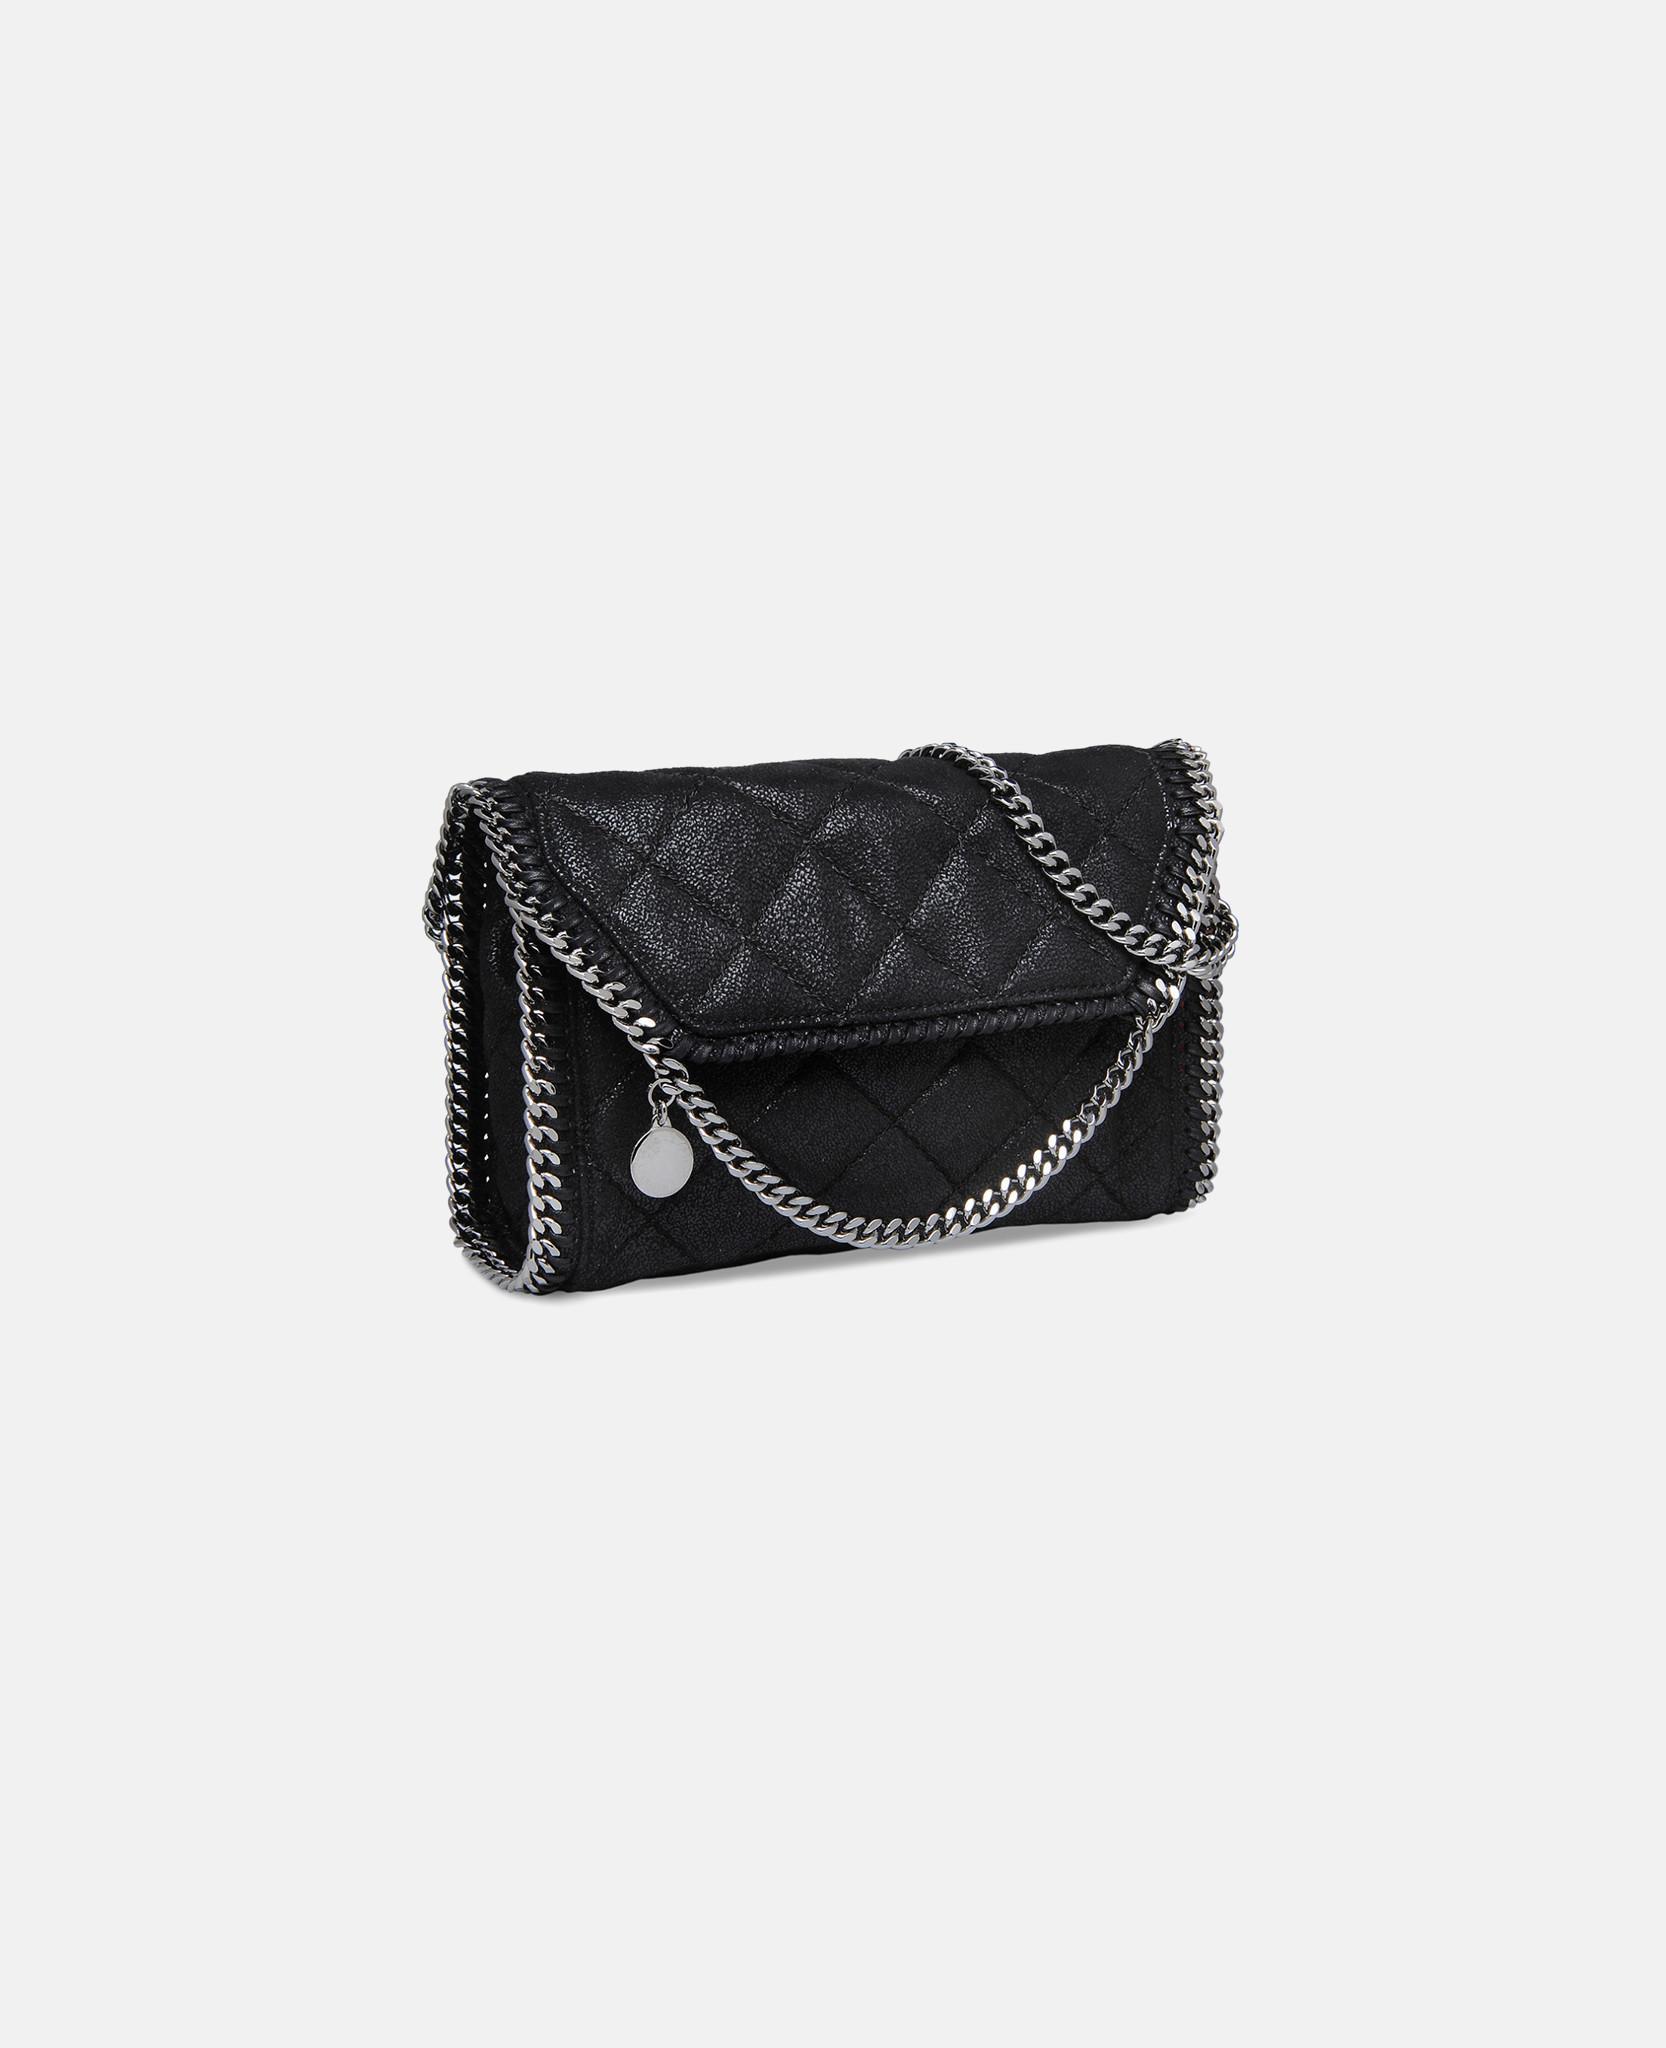 lyst stella mccartney falabella quilted mini bag in black. Black Bedroom Furniture Sets. Home Design Ideas